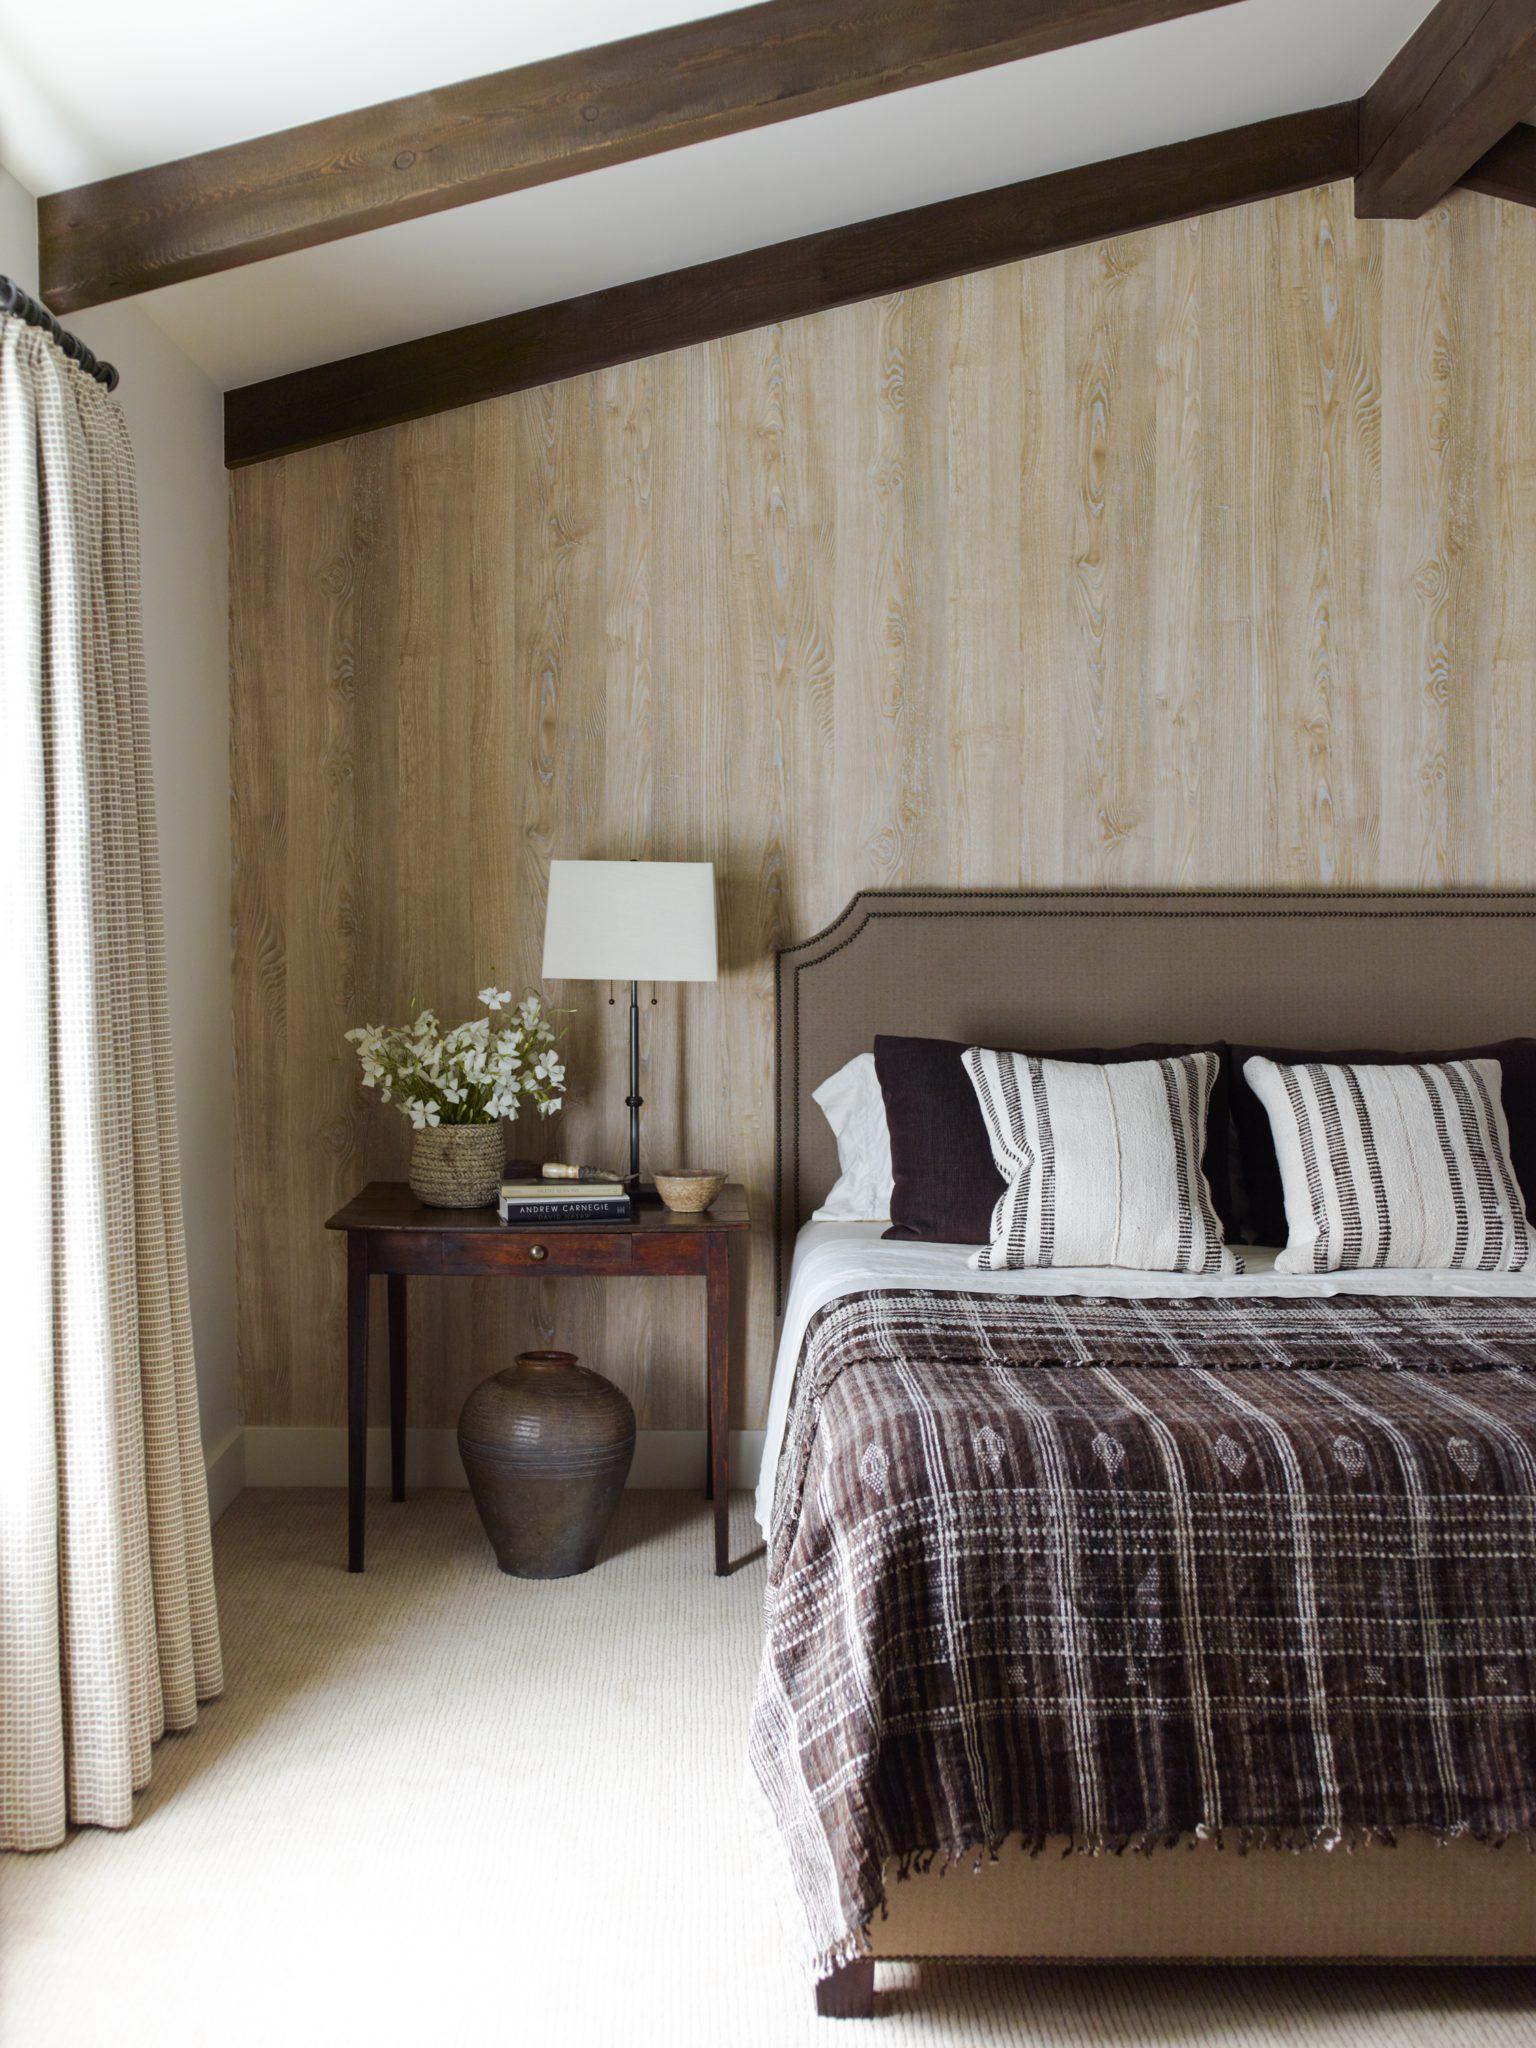 Montana Retreat - Master Bedroom by Kylee Shintaffer